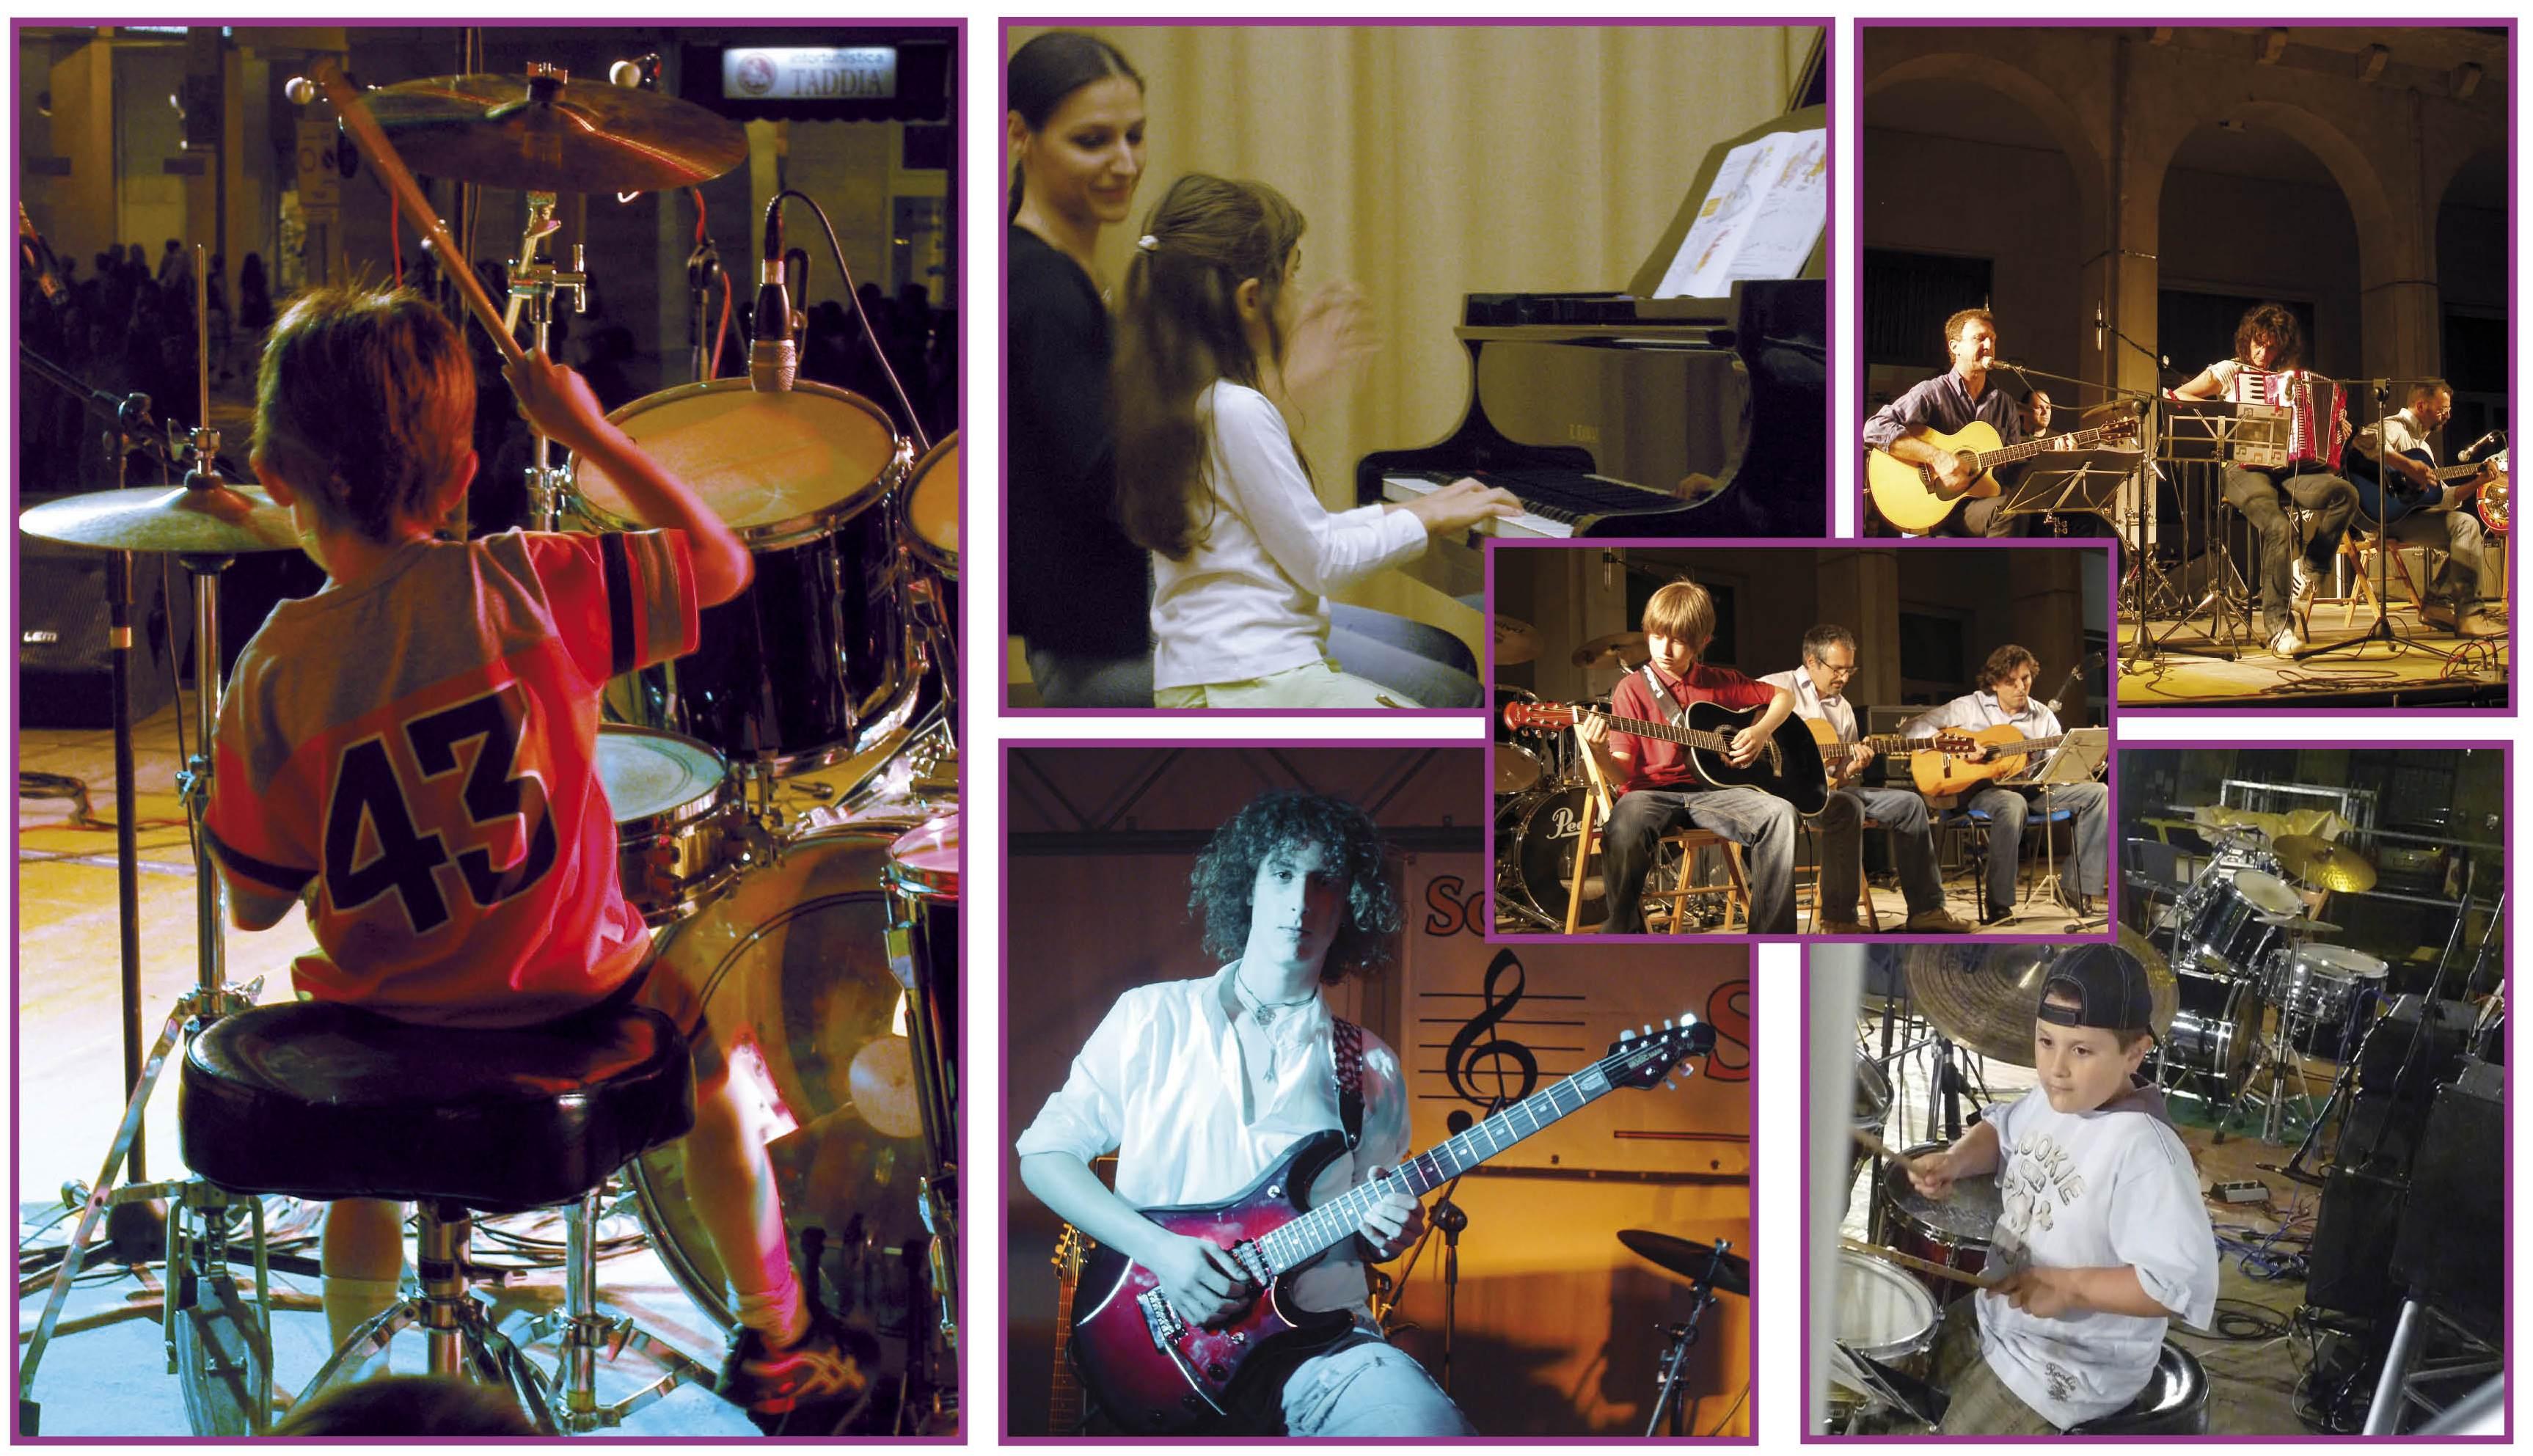 Lezioni di musica 1995 - 3 part 10